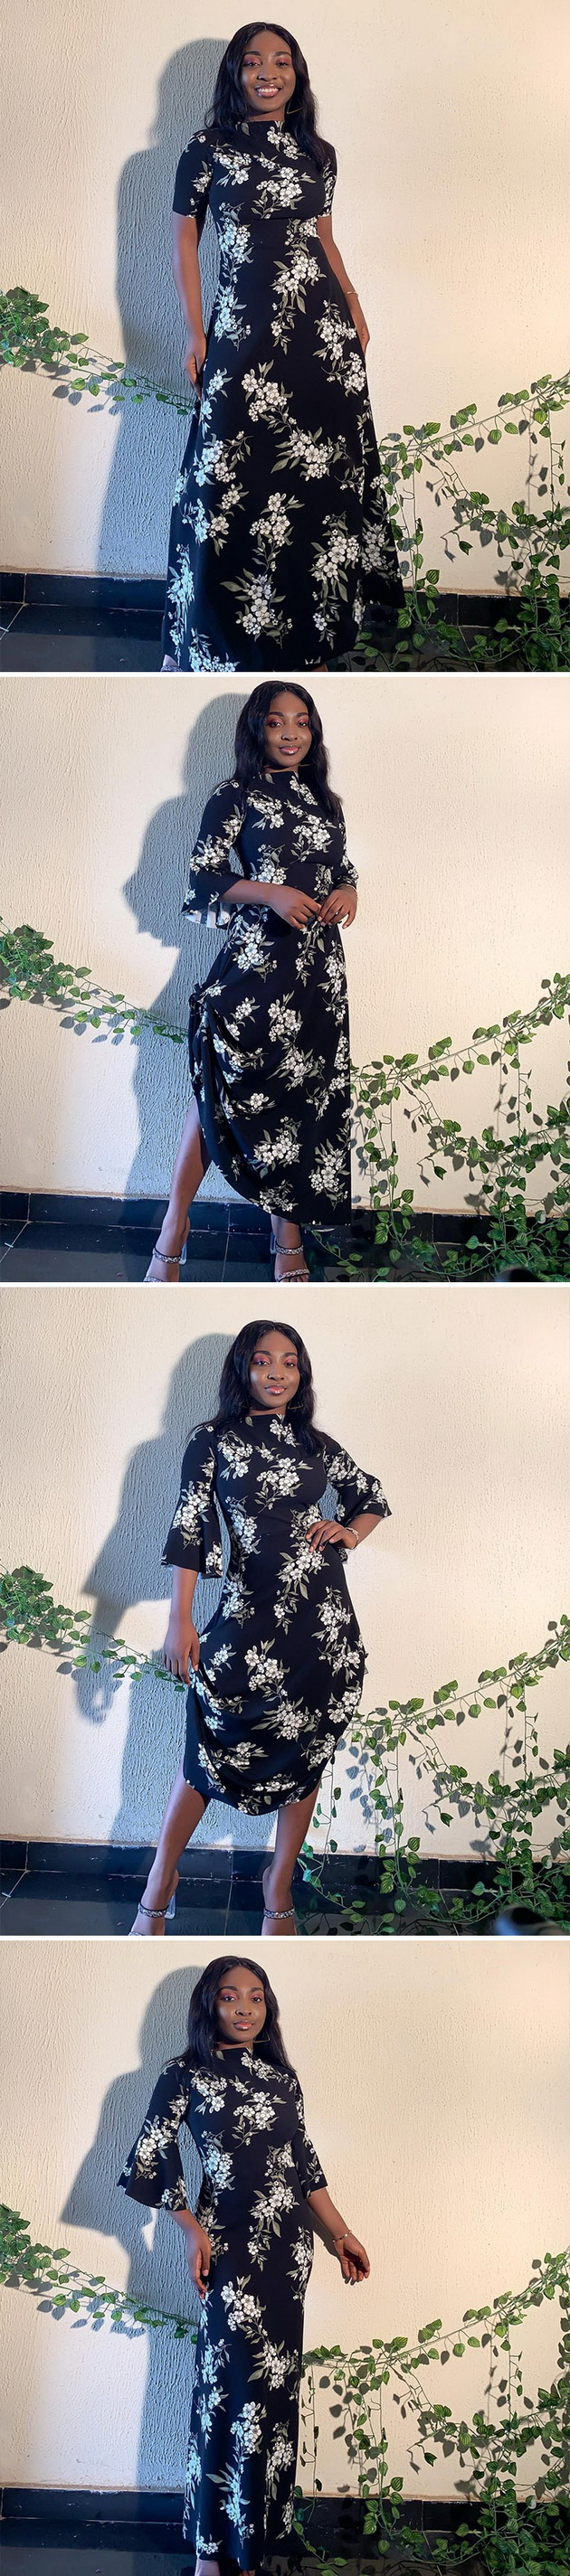 koga-vo-1-fustan-imate-11-razlichni-fustani-nigeriska-dizajnerka-go-voodushevi-svetot-11.jpg